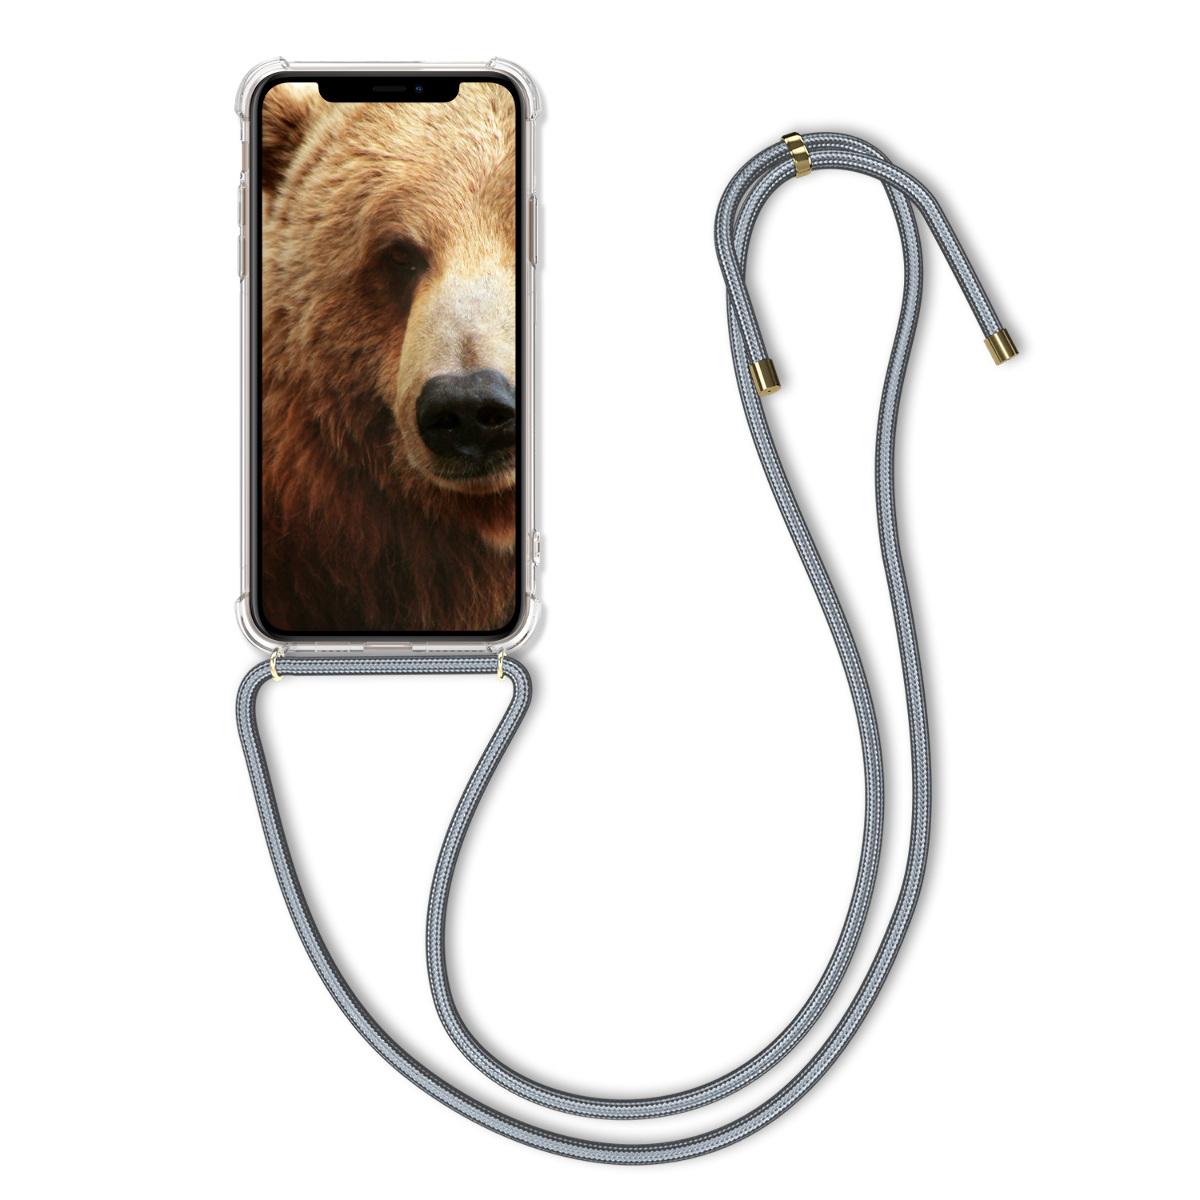 Kvalitní silikonové TPU pouzdro pro Apple iPhone 11 Pro Max - Transparent | Light Gray